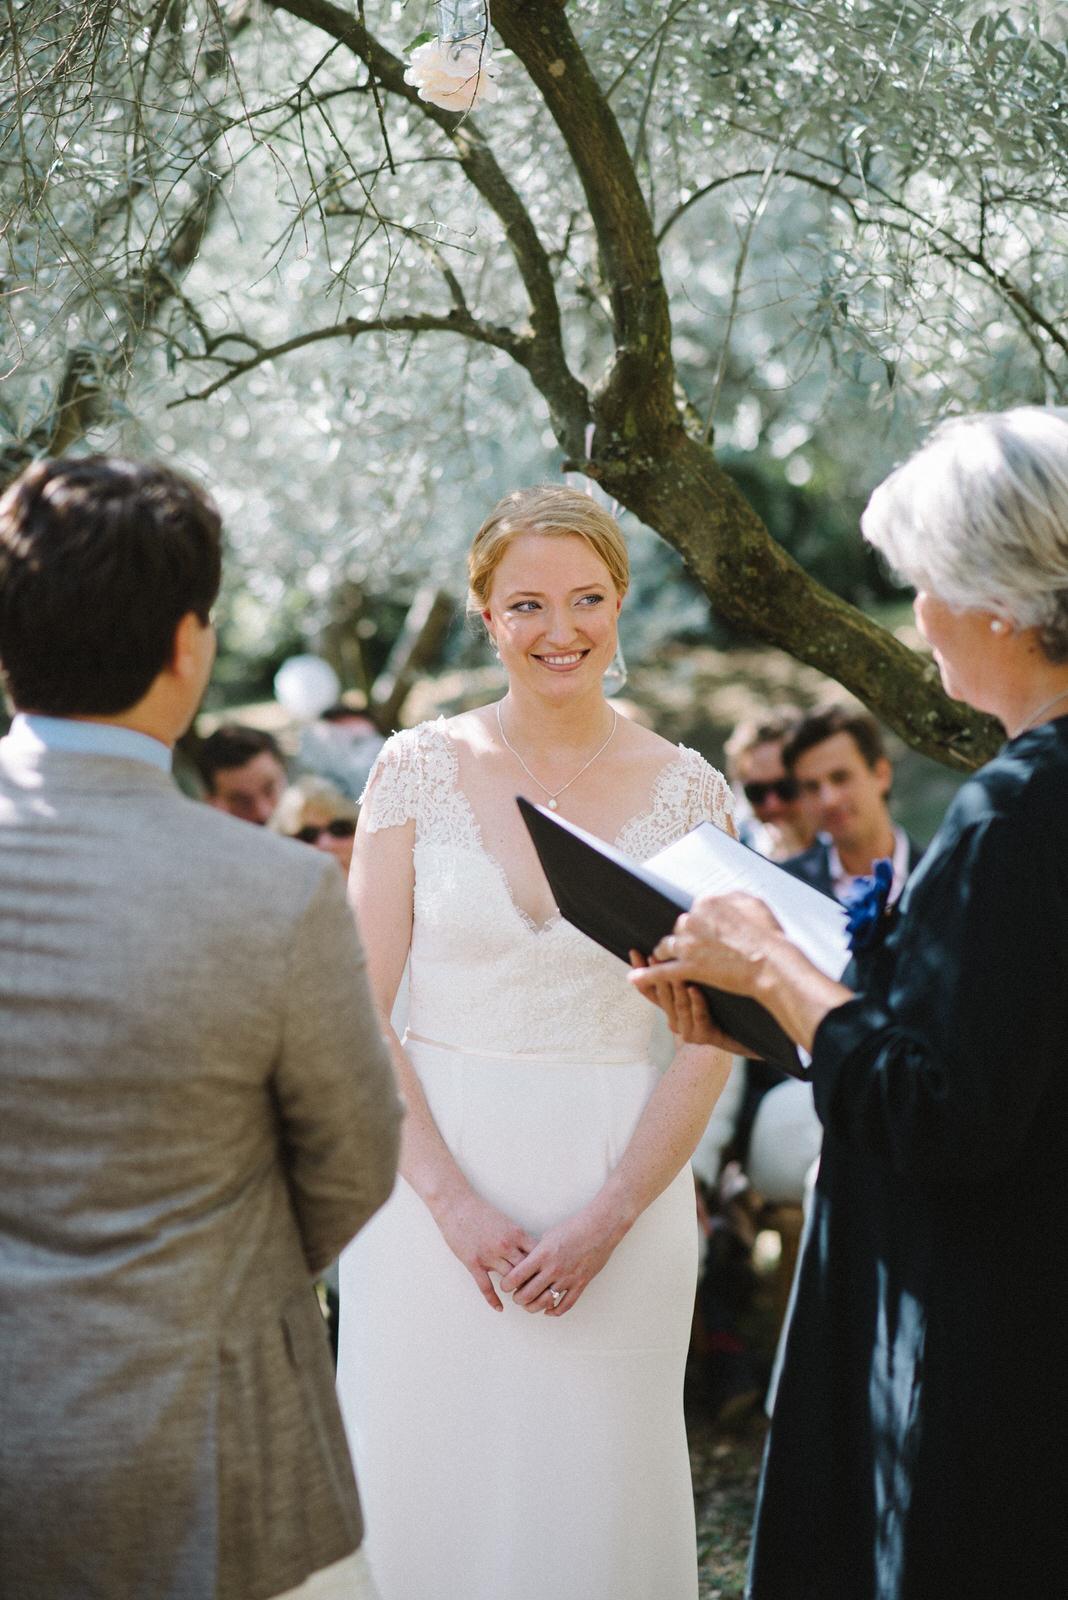 014-LOURMARIN-WEDDING-PHOTOGRAPHER-PROVENCE-WEDDING-ALTERNATIVE-WEDDING-PHOTOGRAPHY-FRANCE-PROVENCE-GARDEN-WEDDING.JPG